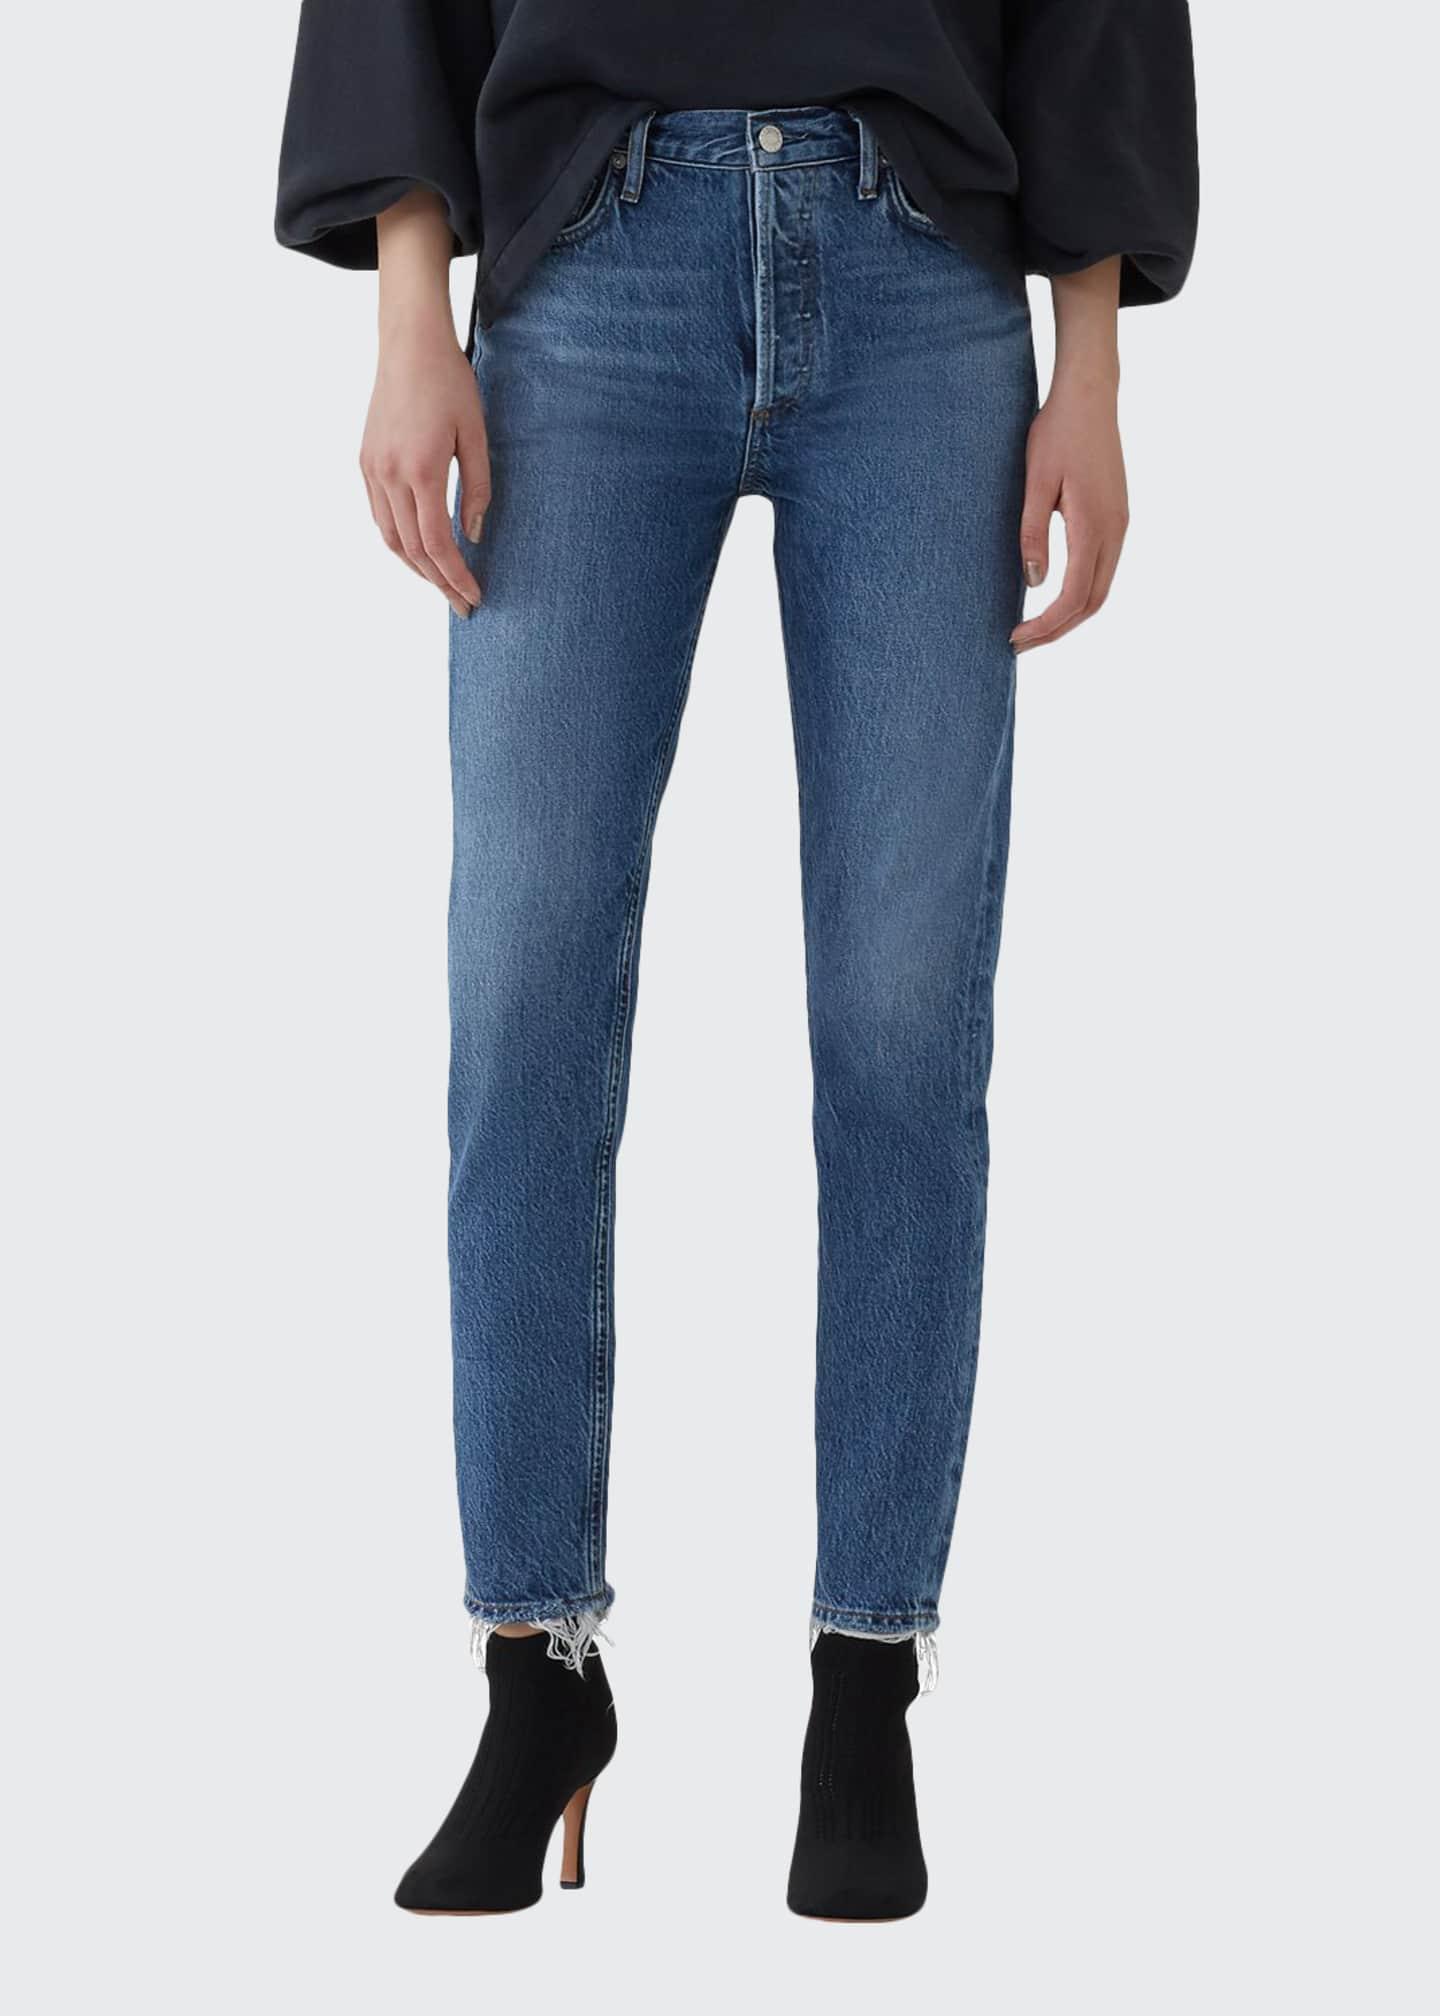 AGOLDE Jamie High-Rise Organic Denim Skinny Jeans with